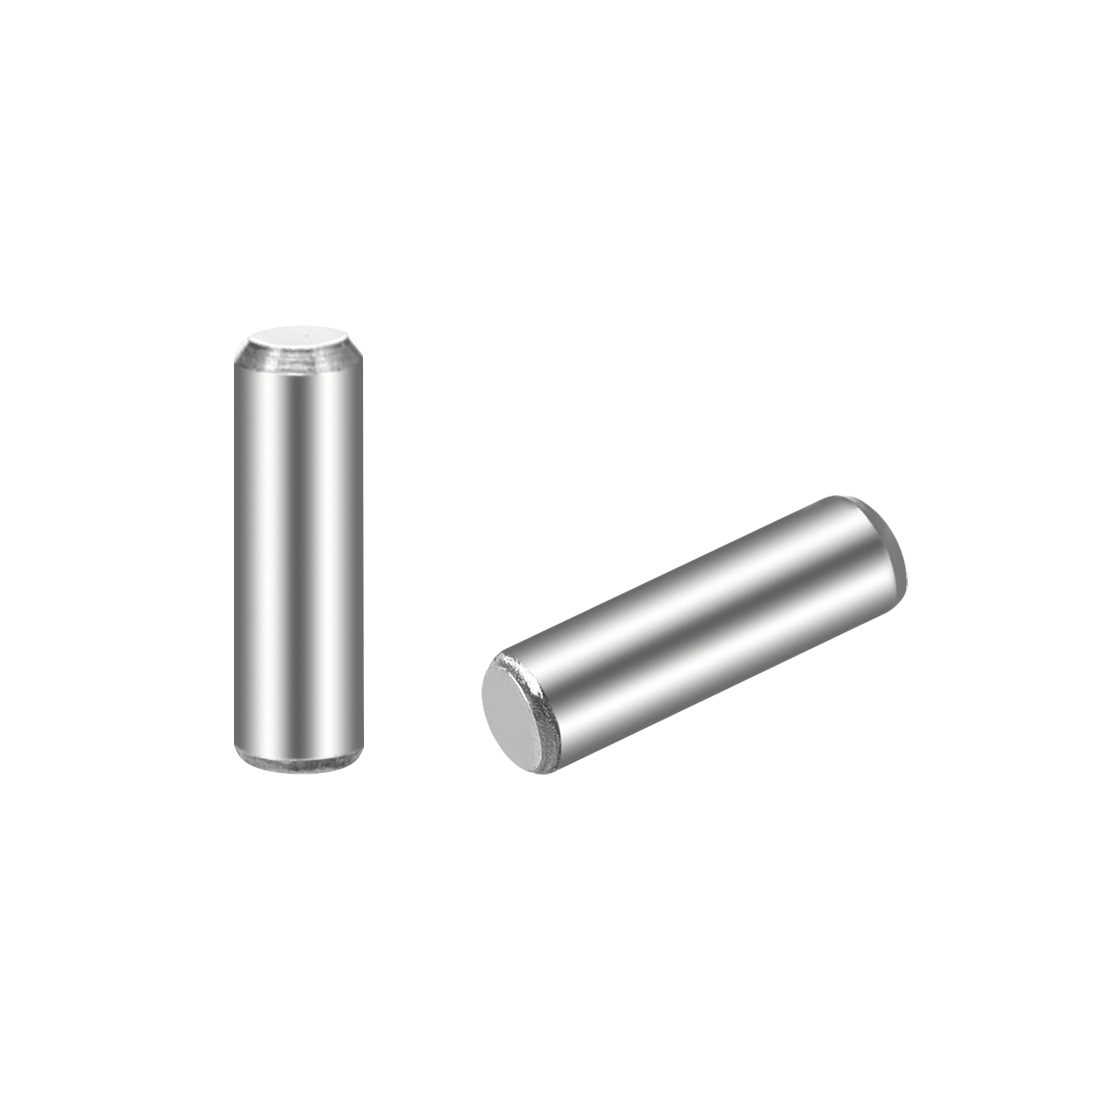 50Pcs 3mm x 10mm Dowel Pin 304 Stainless Steel Shelf Support Pin Fasten